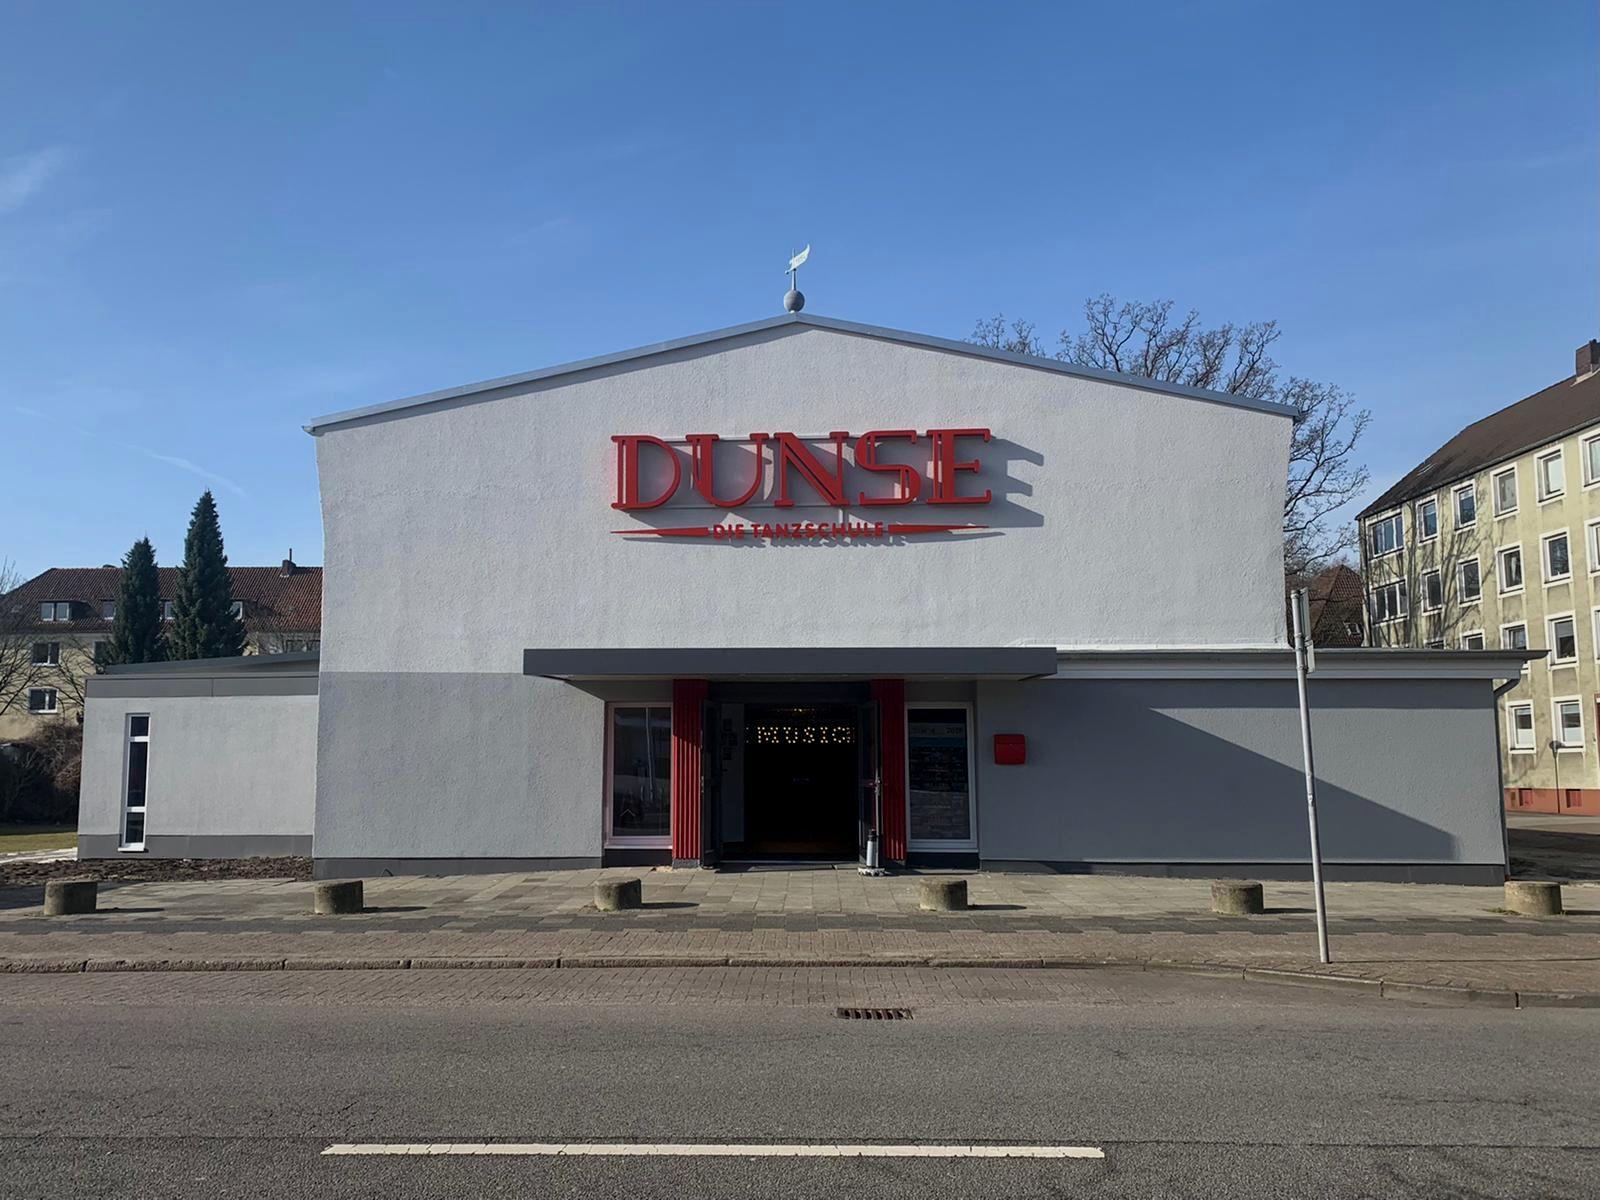 ADTV Tanzschule Dunse